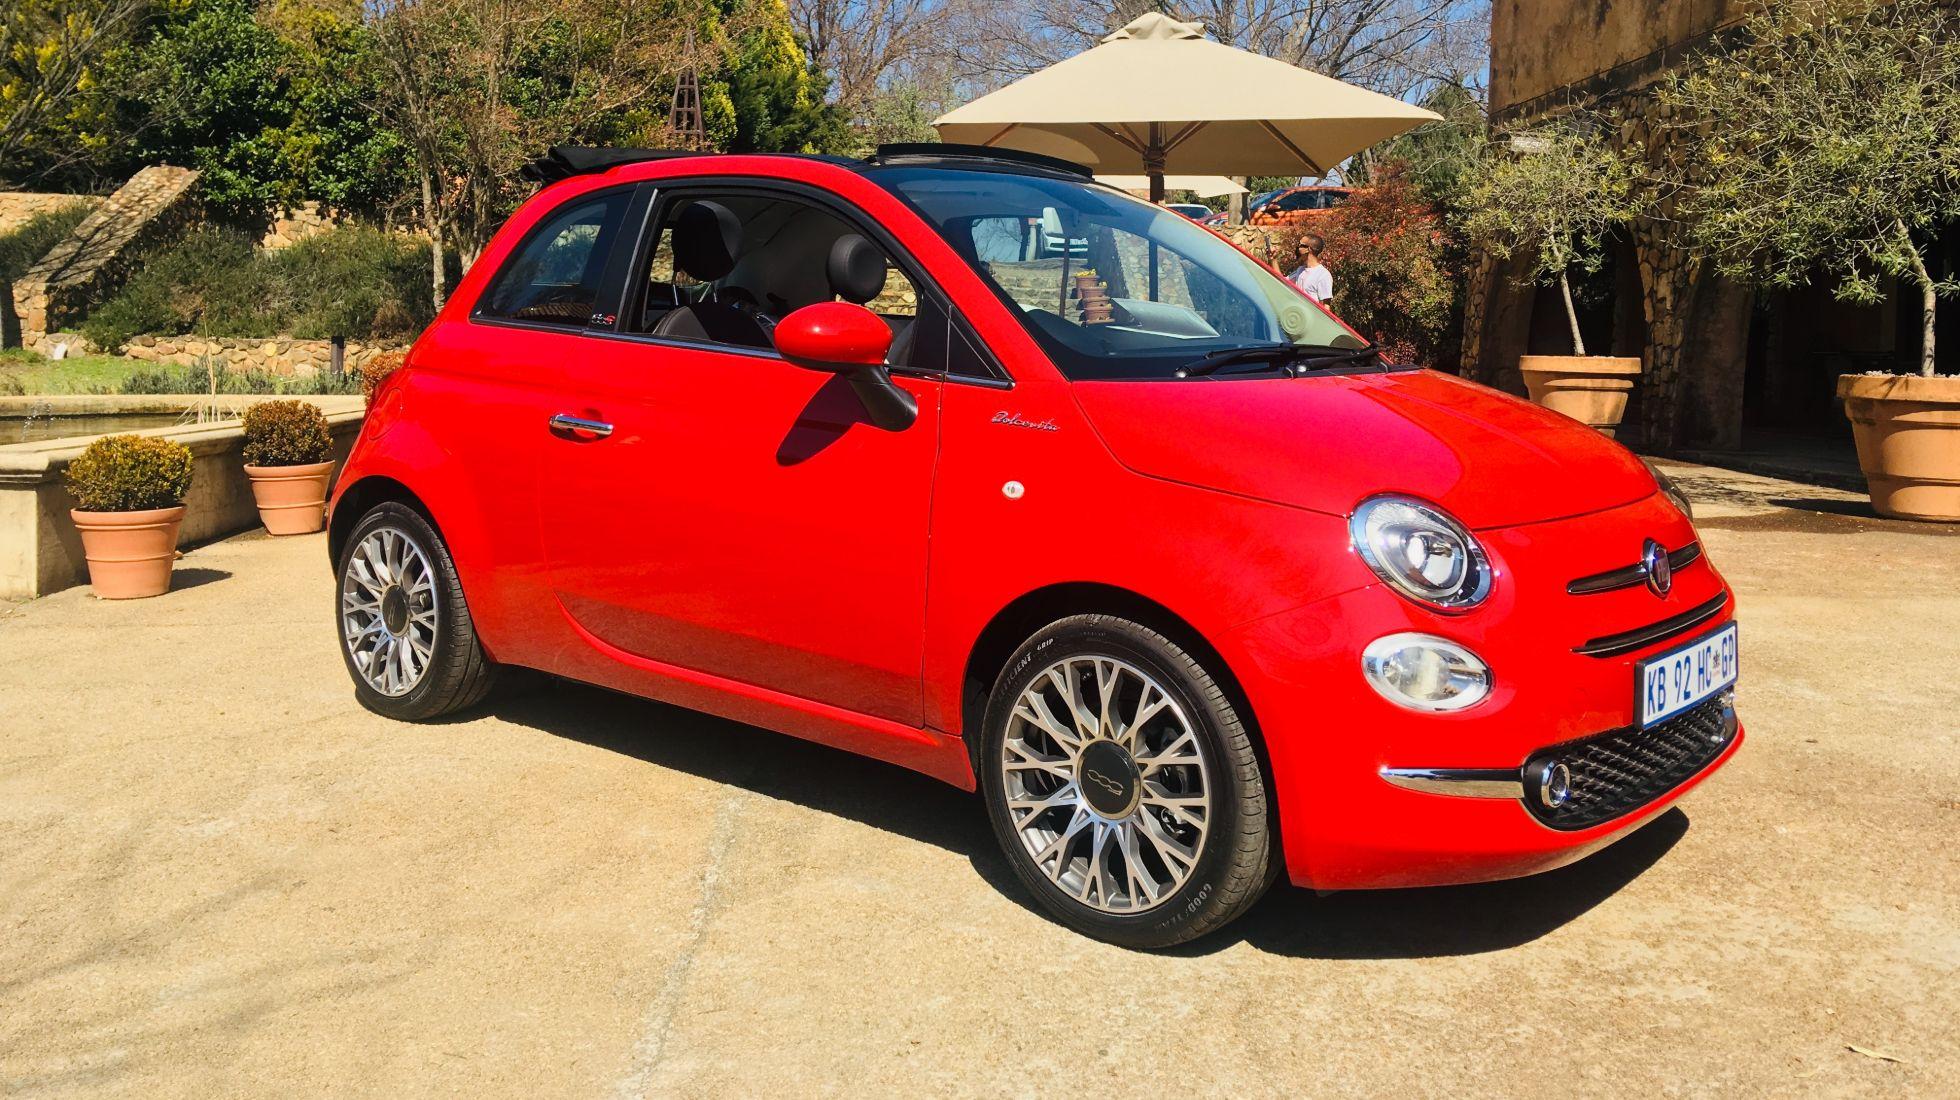 First Drive: Fiat 500 - Ciao Bambino